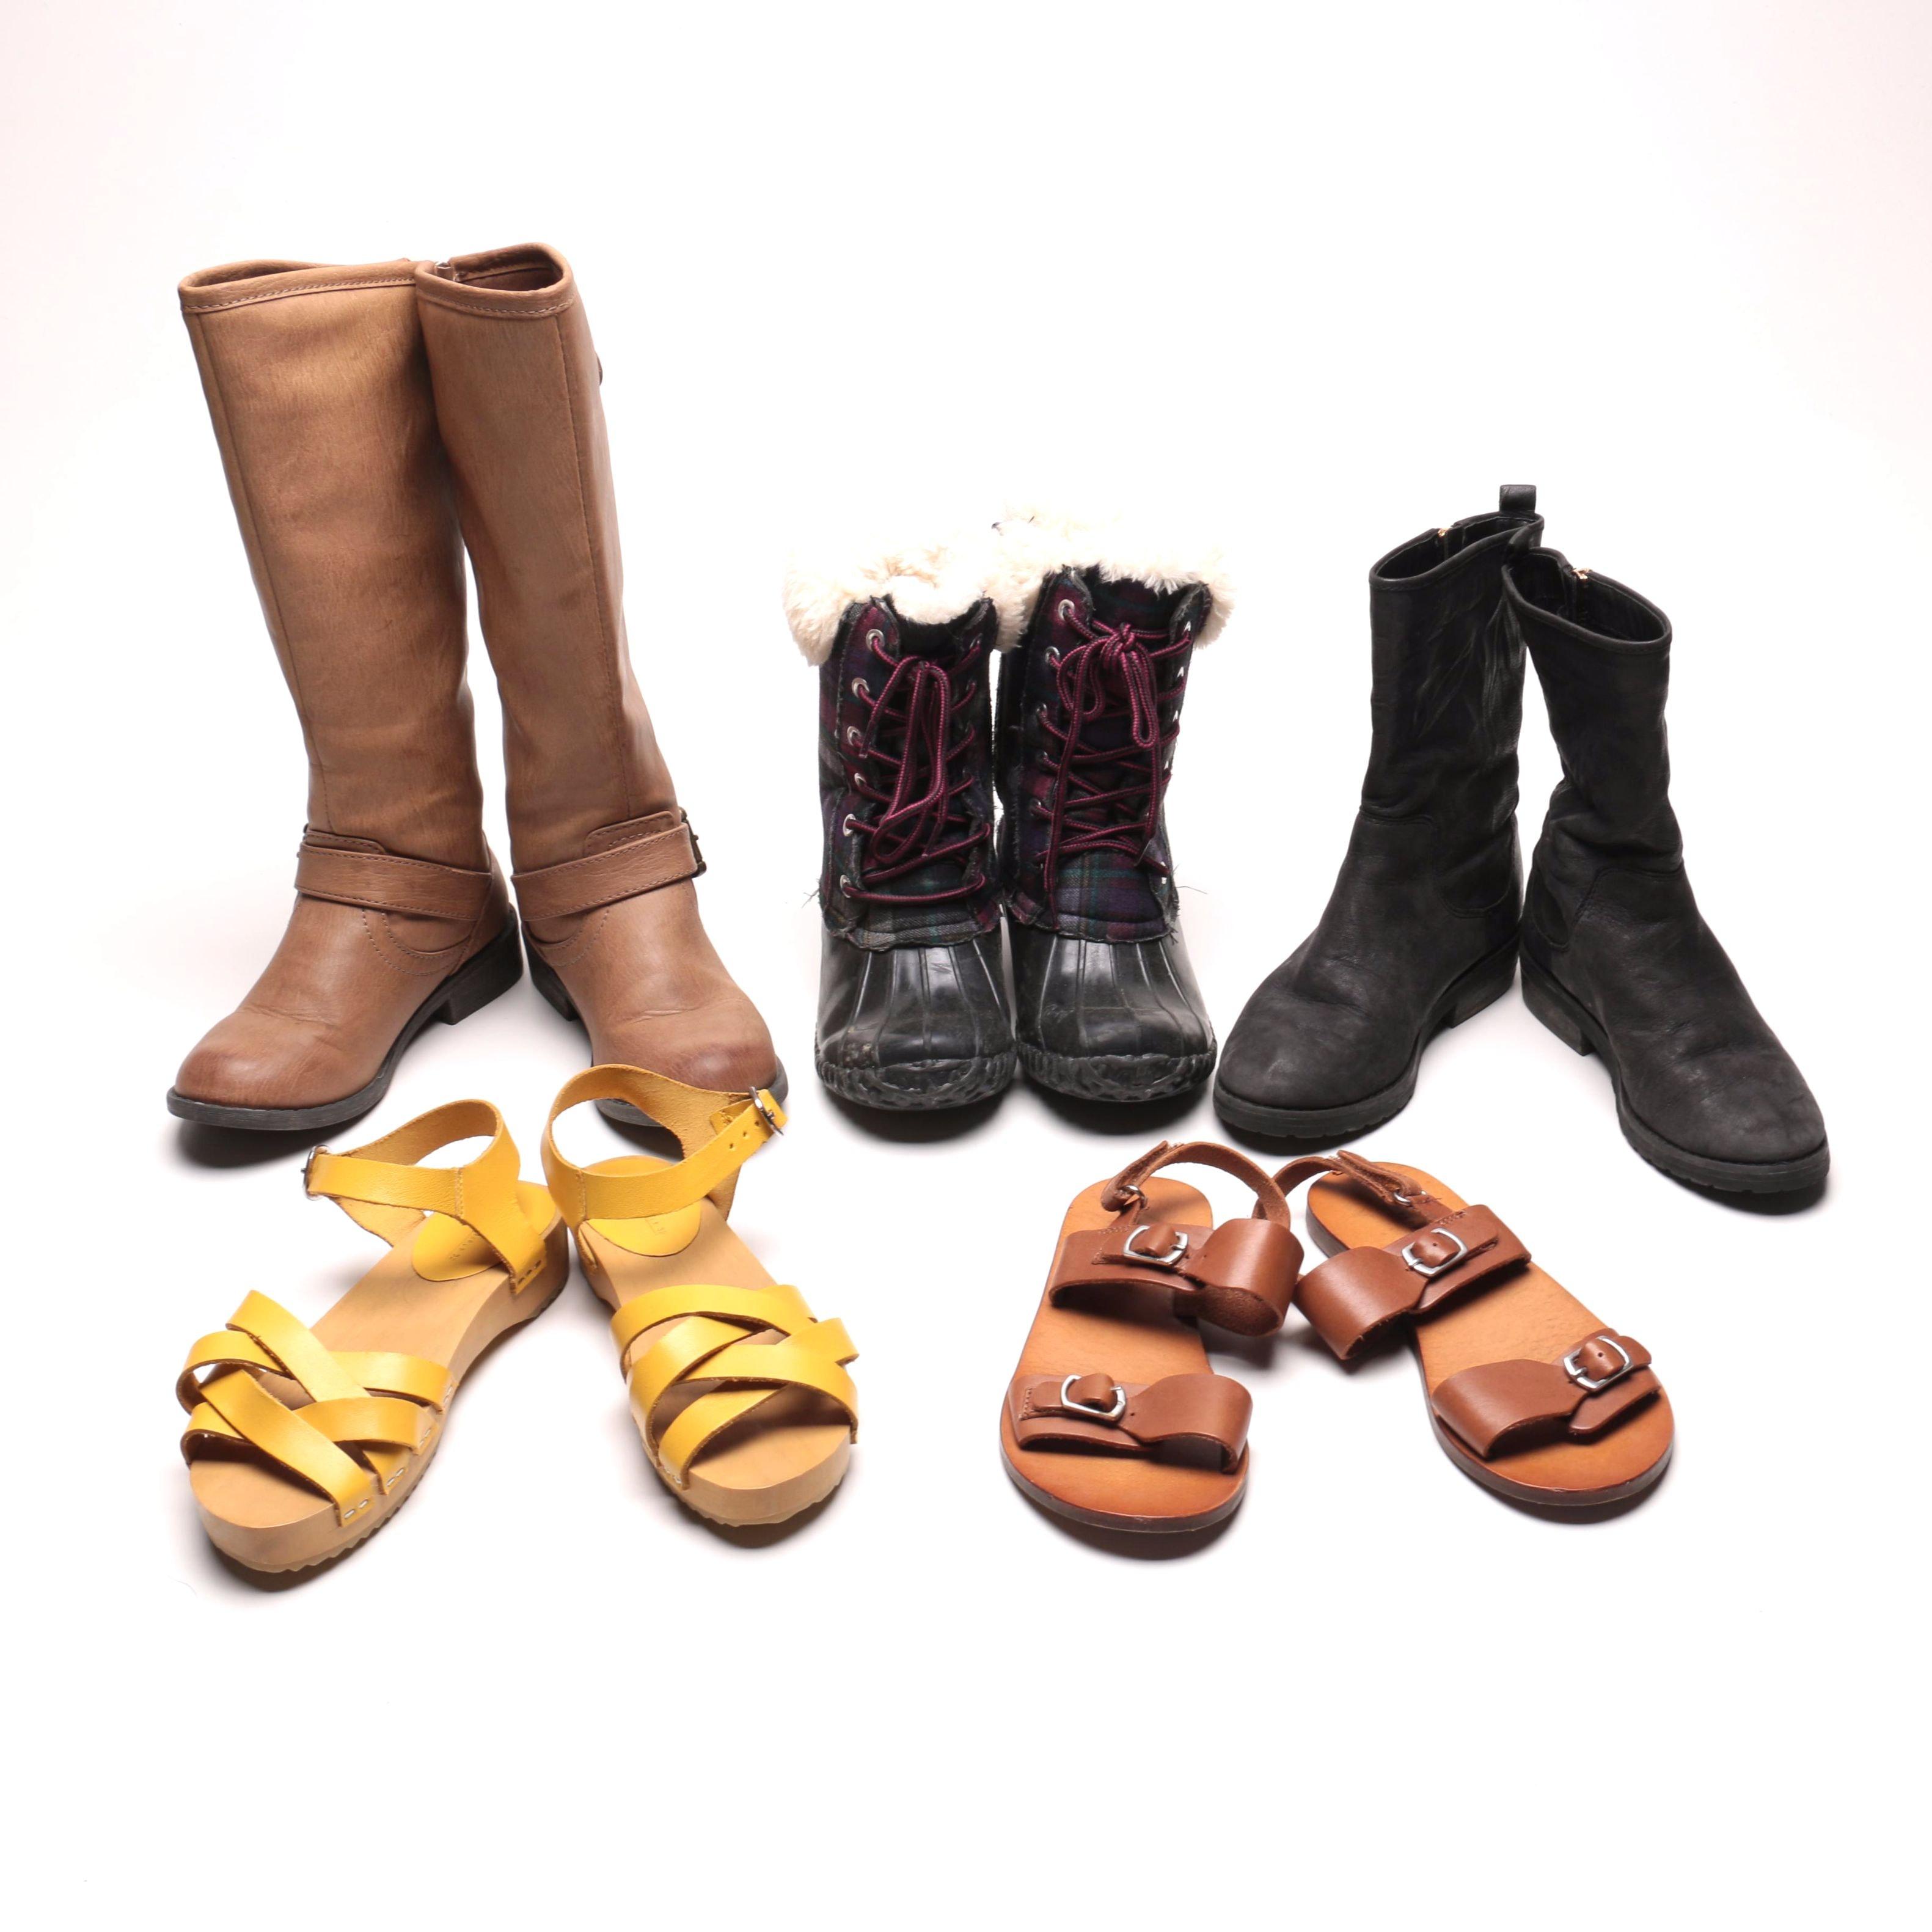 Assortment Of Children's Shoes